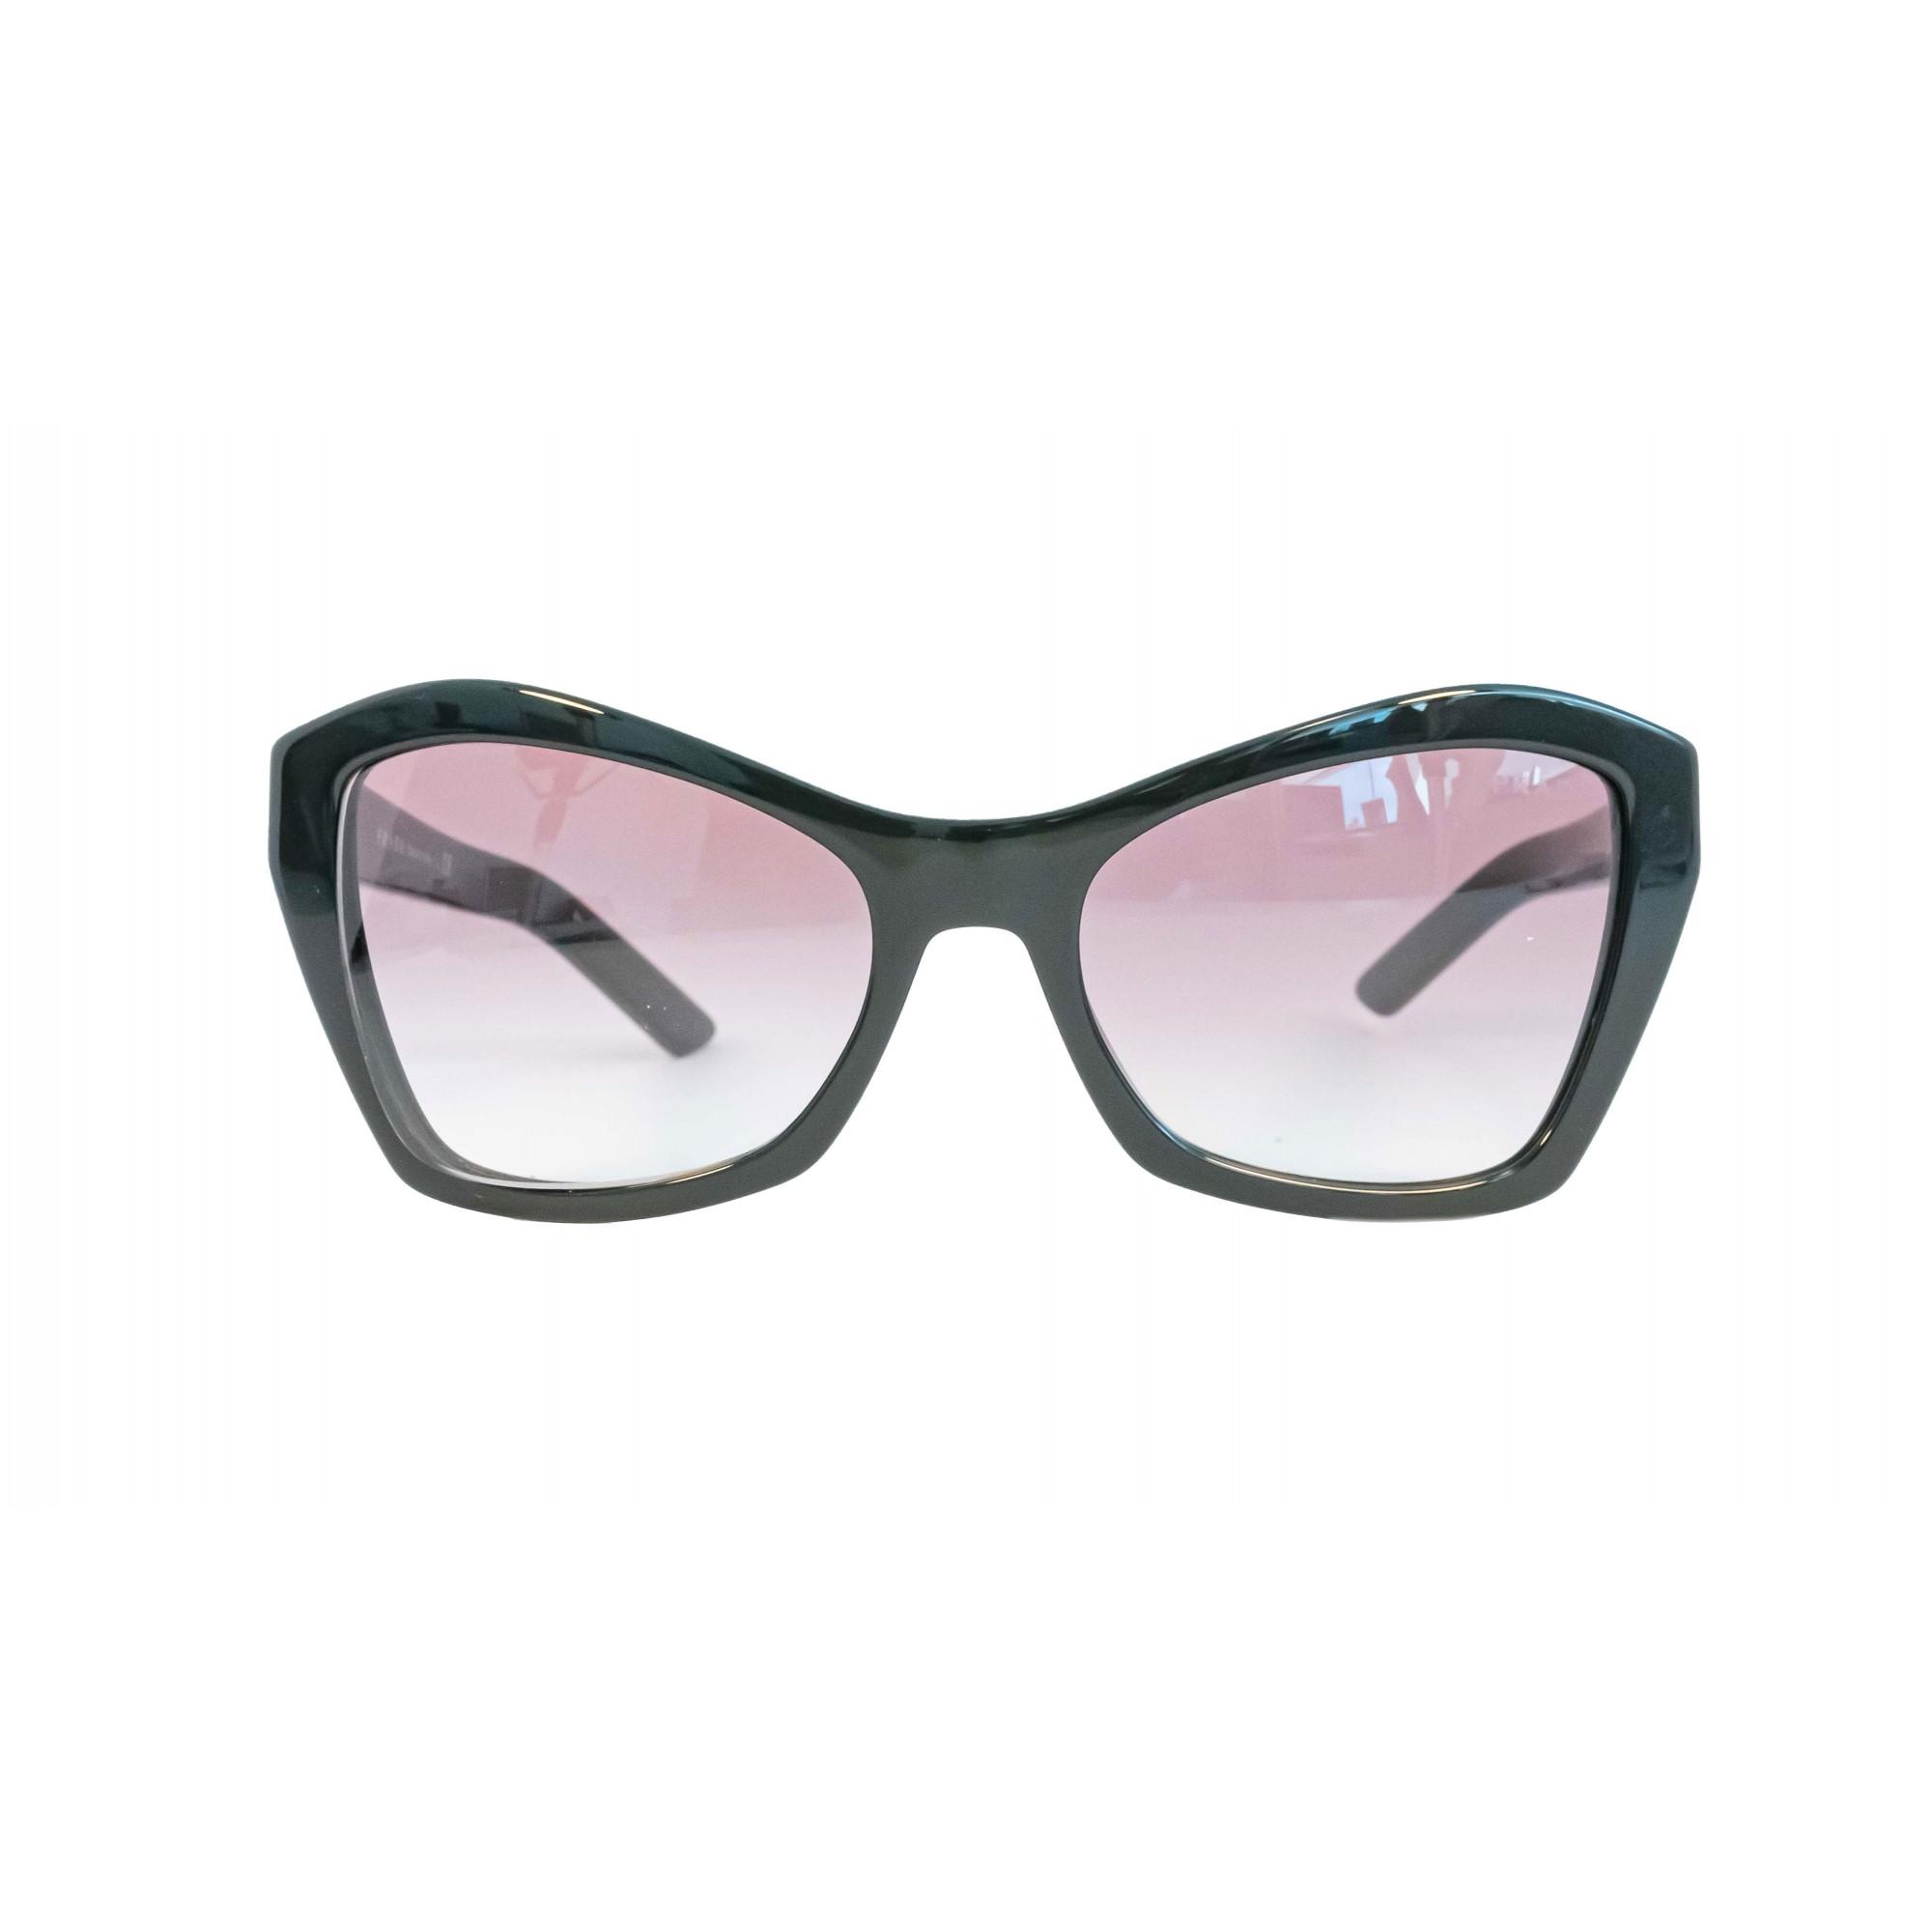 Óculos Prada Borboleta Spr07x 1ab0a7 55 Preto